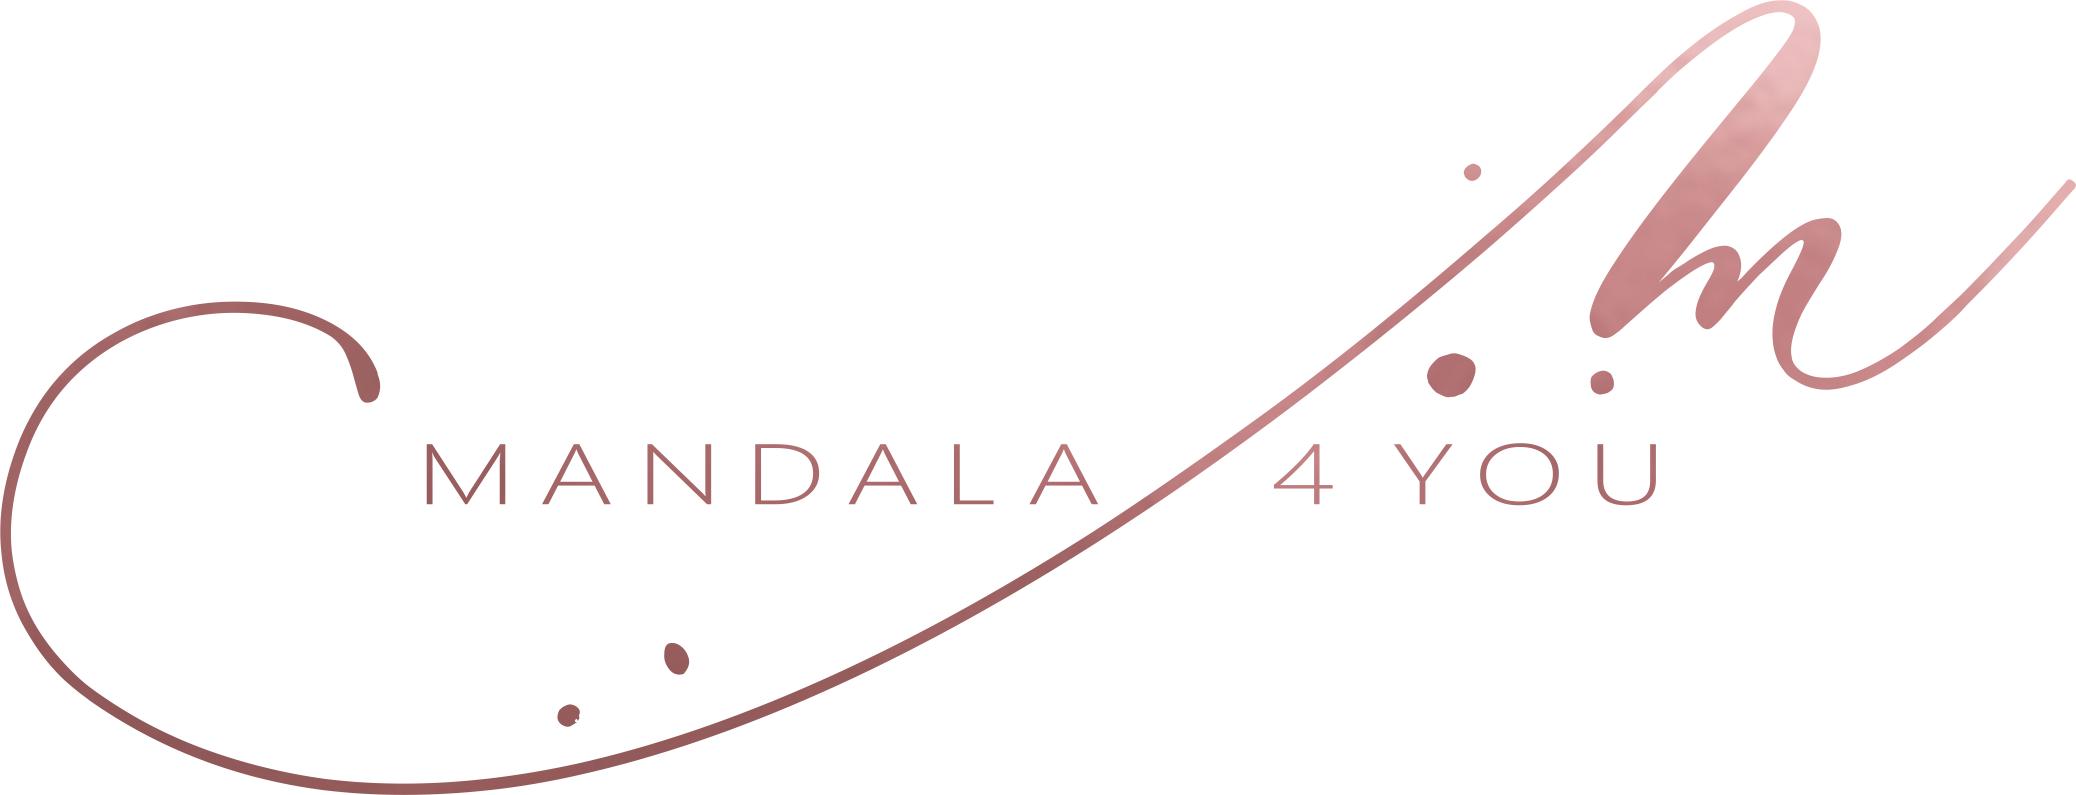 Mandala 4 you